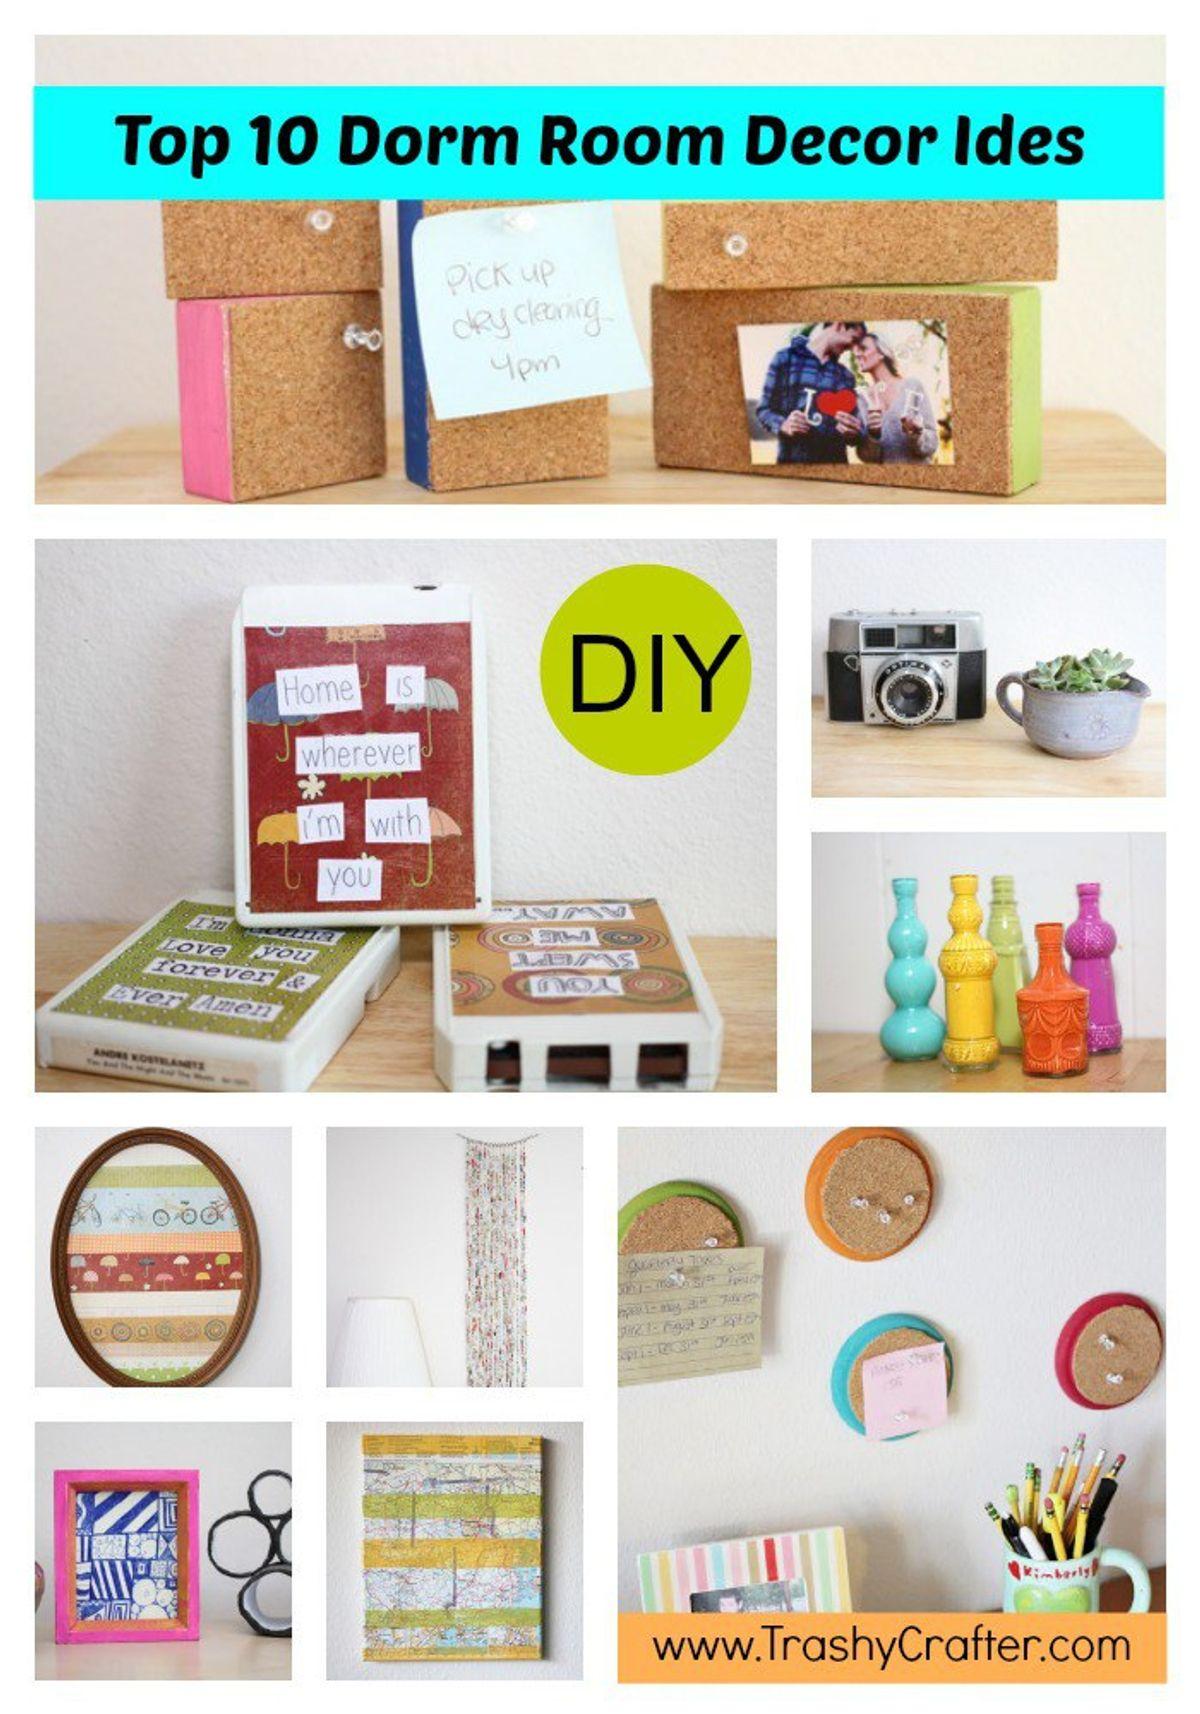 10 Diy Decor Ideas To Spruce Up Your Dorm